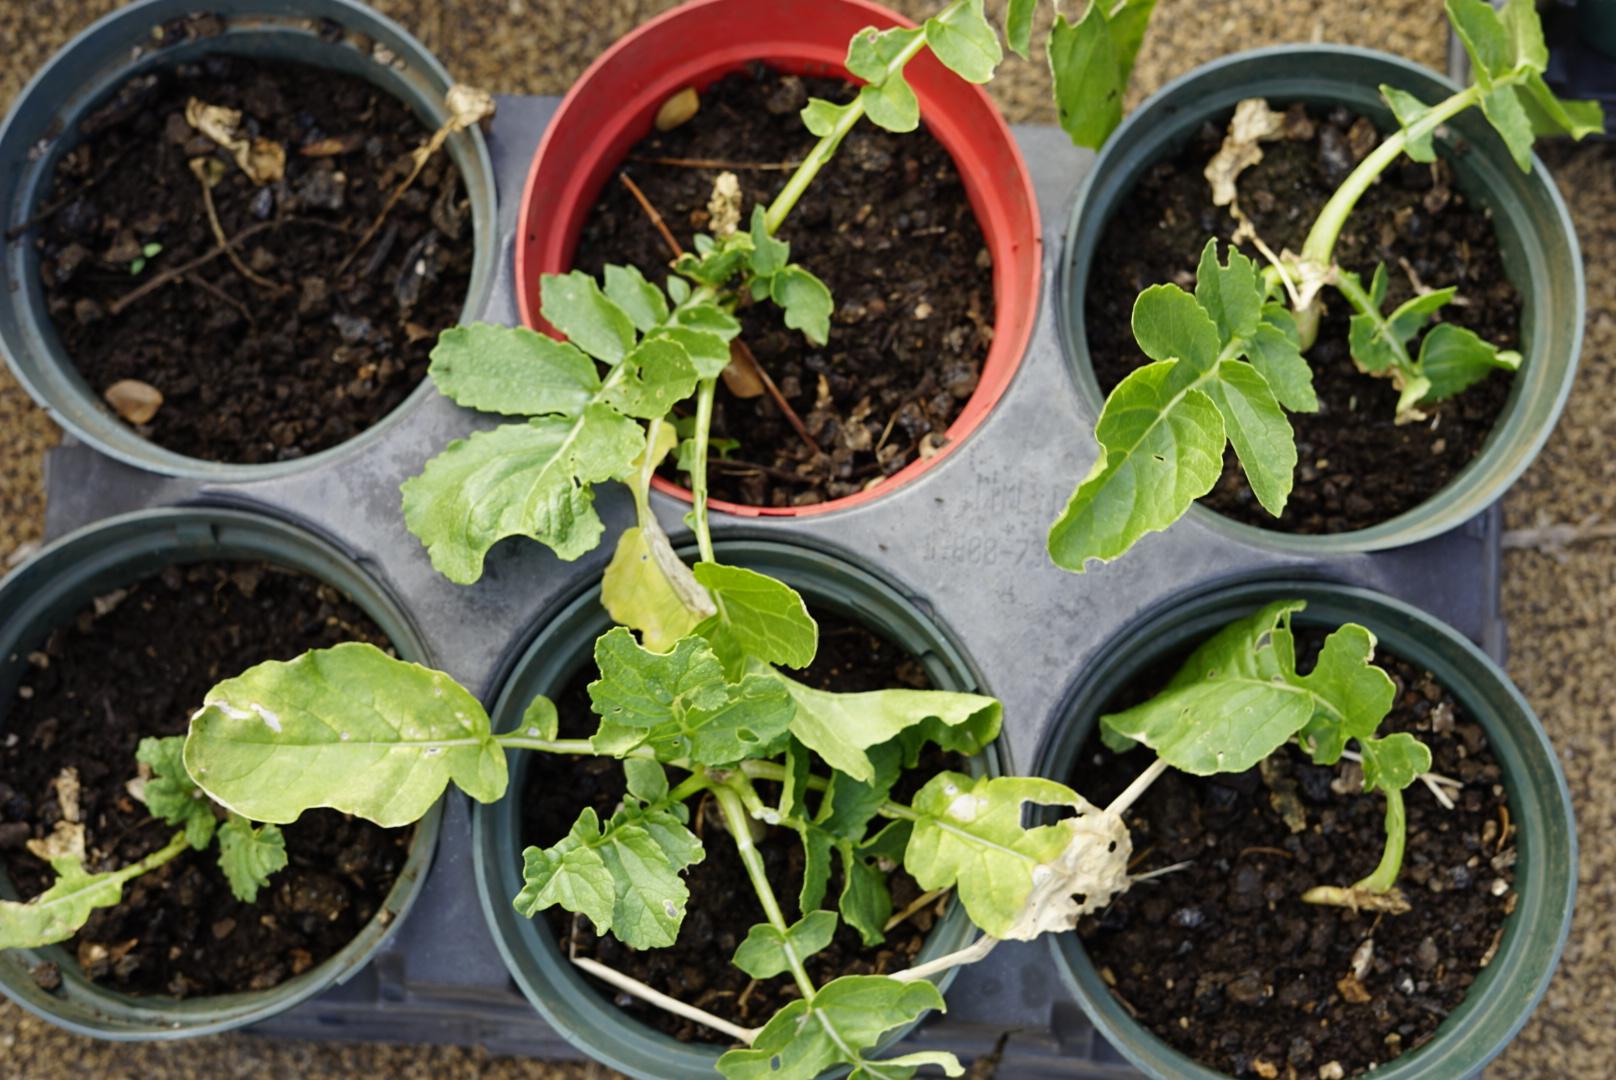 Watermelon Turnip - Non-GMO & always picked fresh